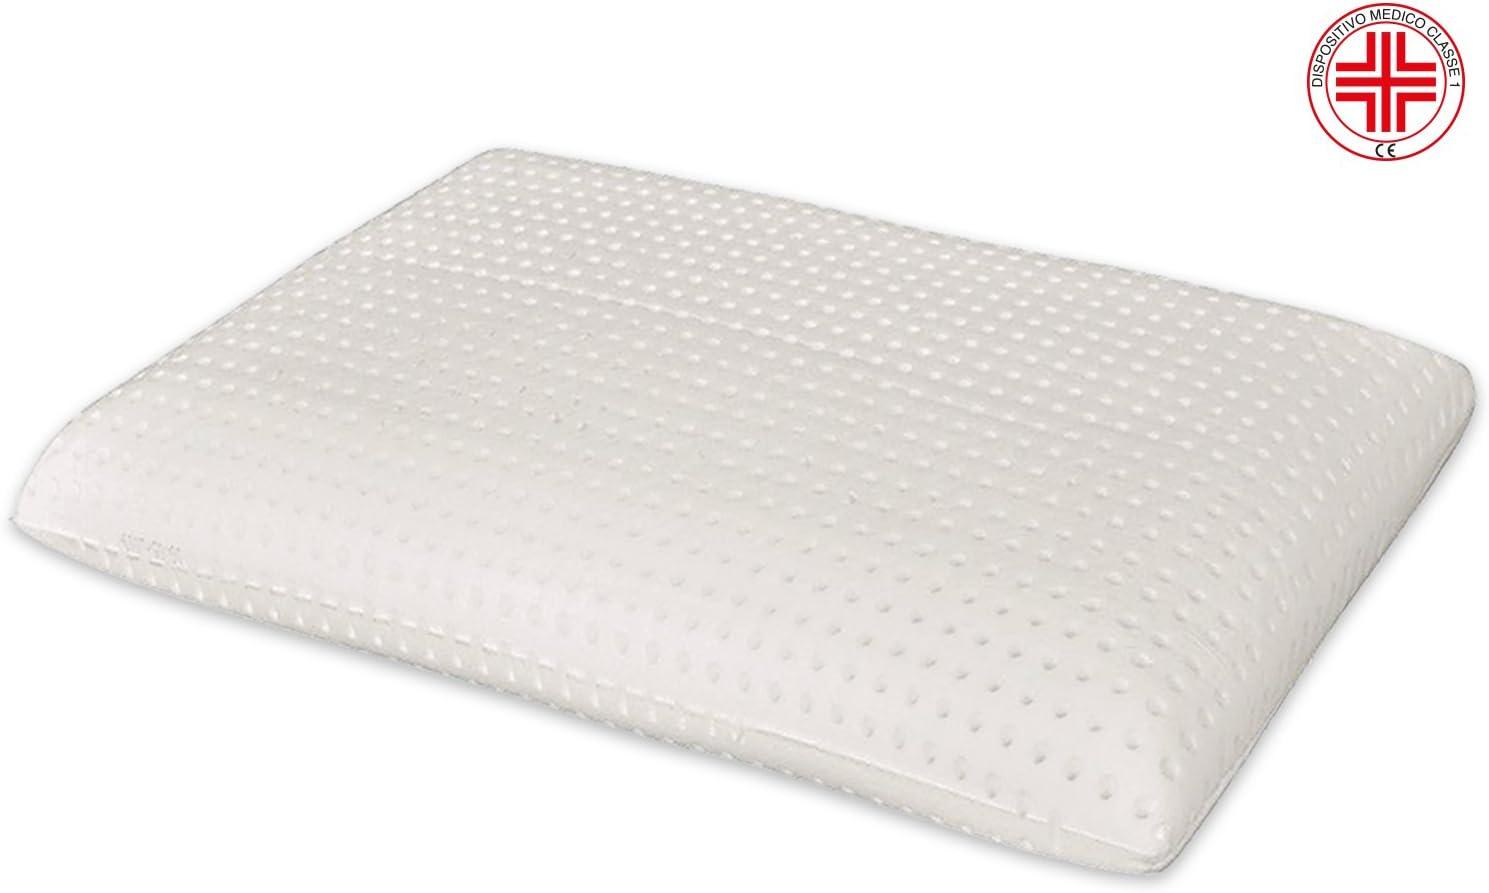 Marcapiuma - Almohada Viscoelástica Memory Foam 70 cm Alta 12 cm Modelo Jabón Perforado con Funda 100% ALGODÓN - Almohada Cervical Ortopédica - Producto Sanitario CE - 100% Fabricada en Italia